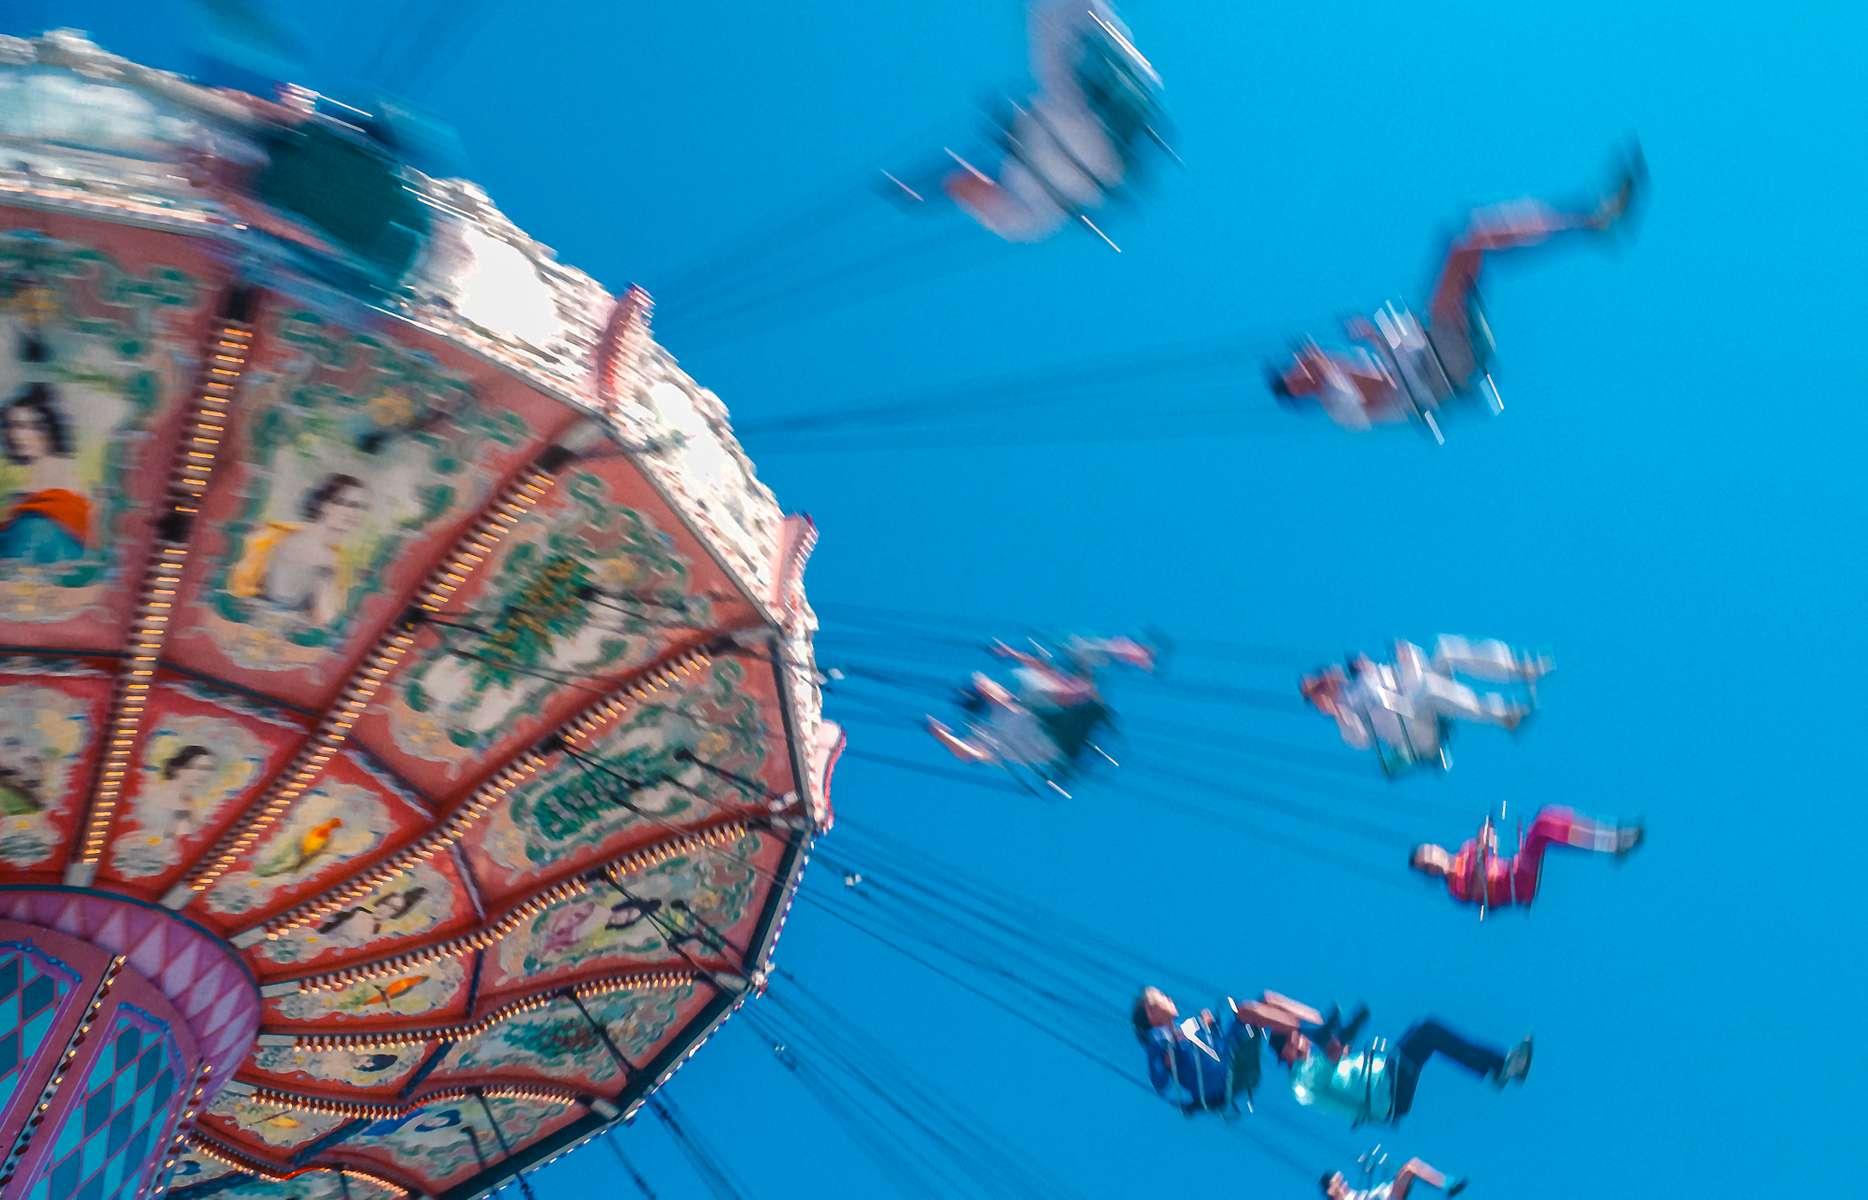 Carnival_ride